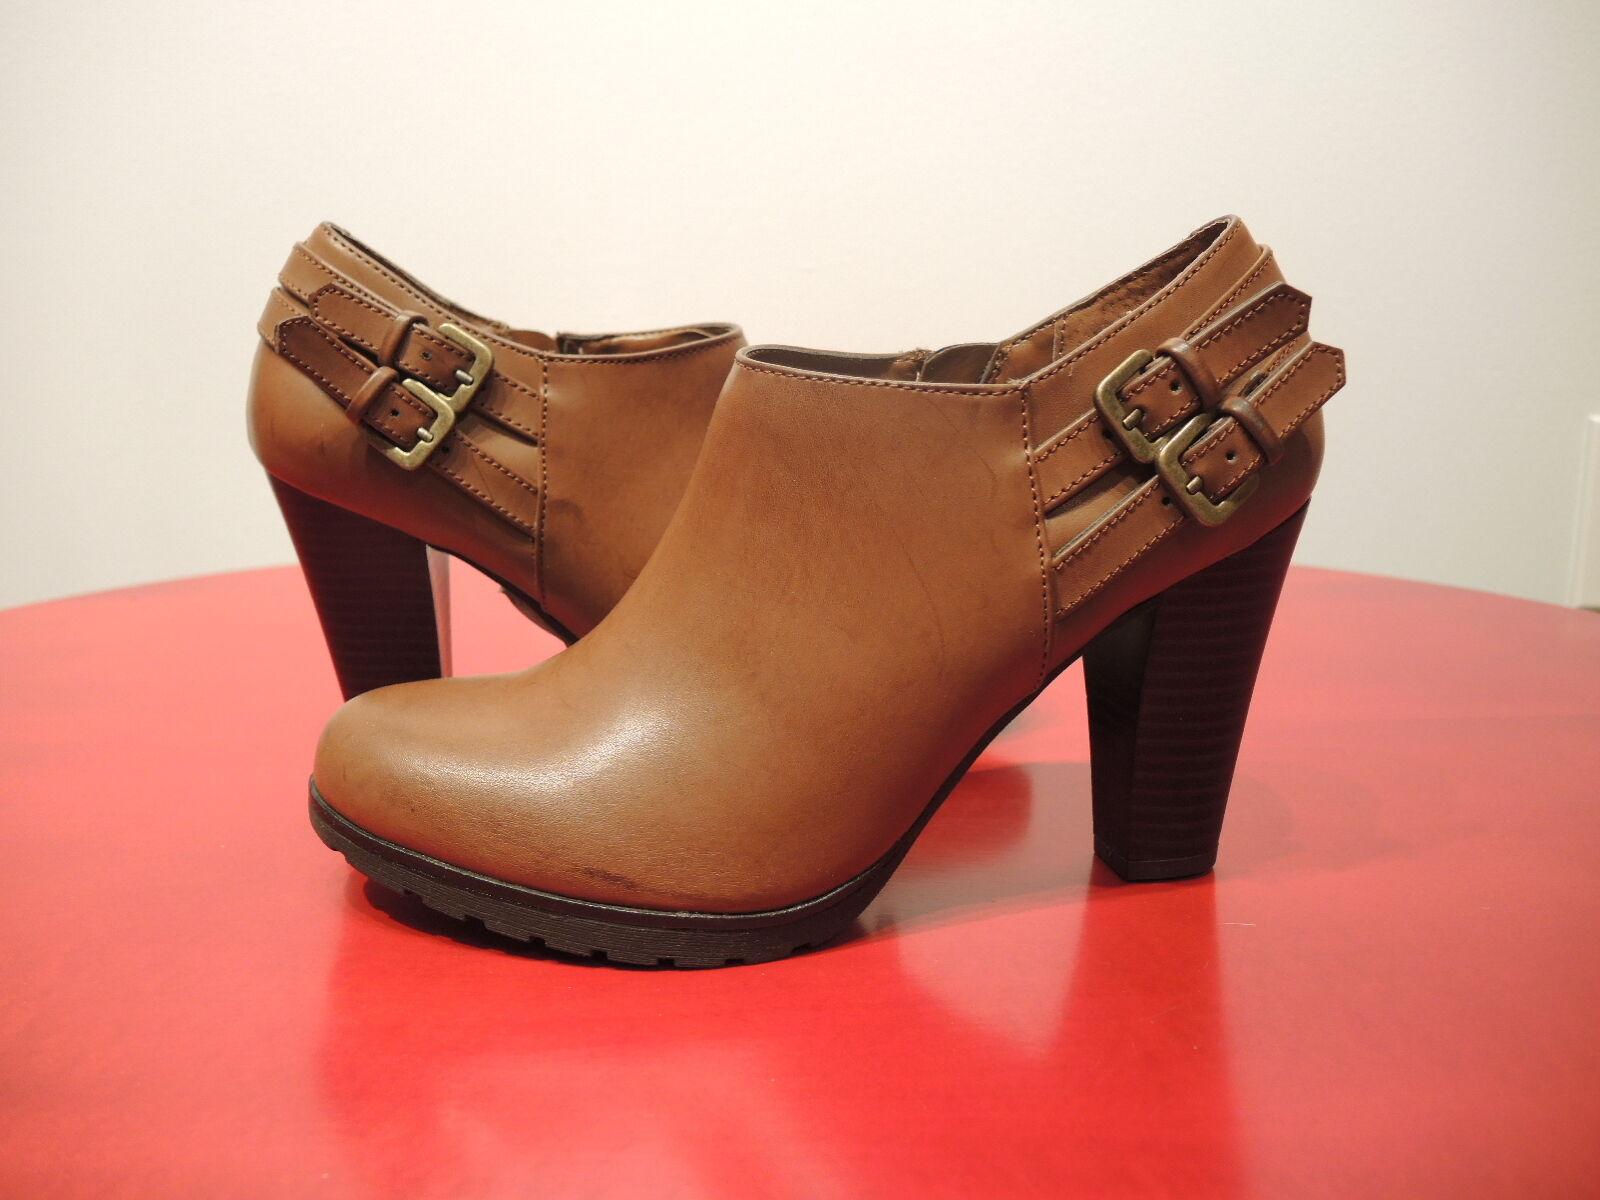 White Mountain Heeled Booties Size 7 1 2  - orange Brown was  159